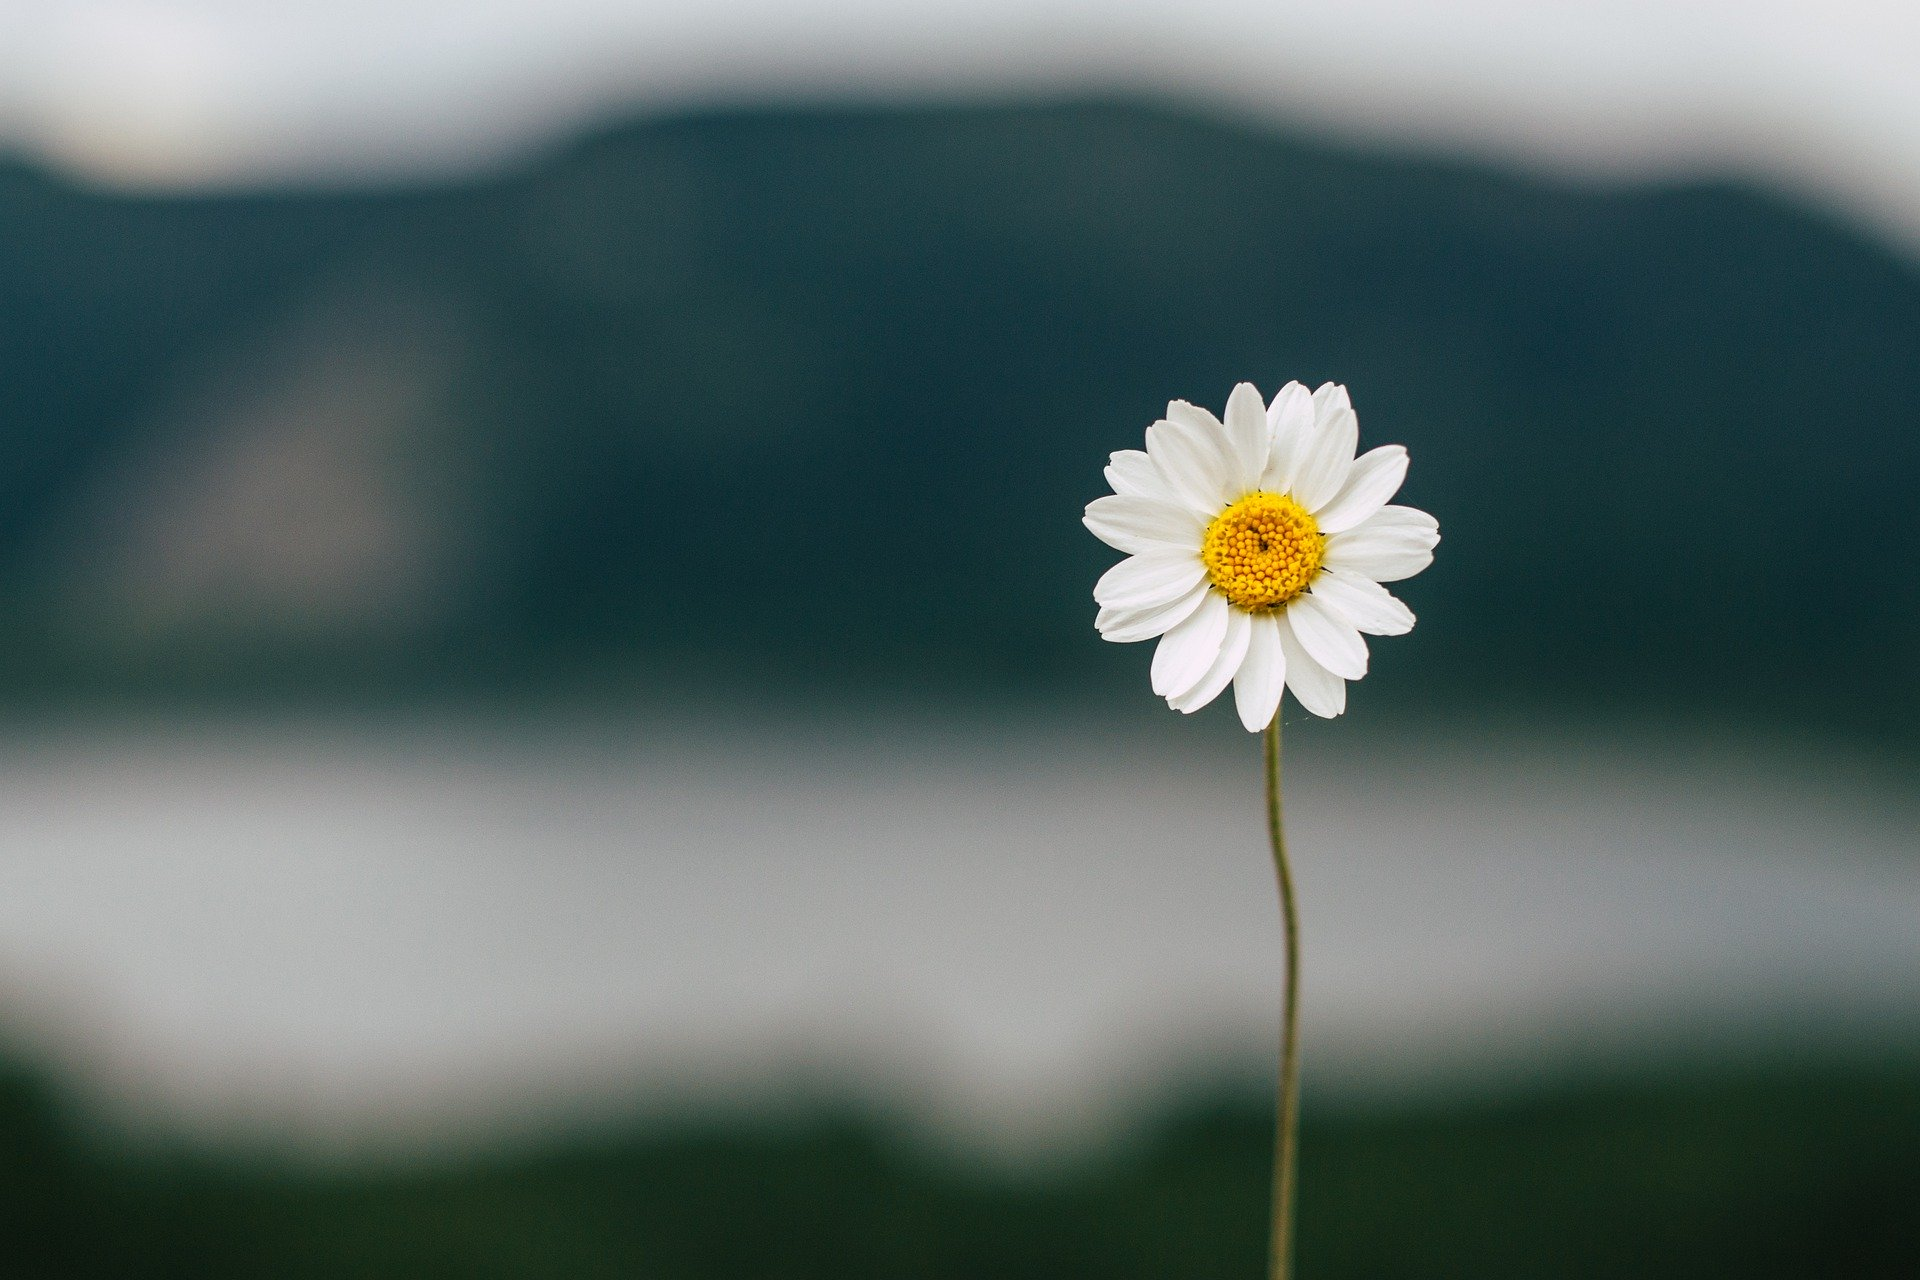 Eskalationen, Egoismus & Ellenbogengesellschaft – die Welt, in der die Kinder leben